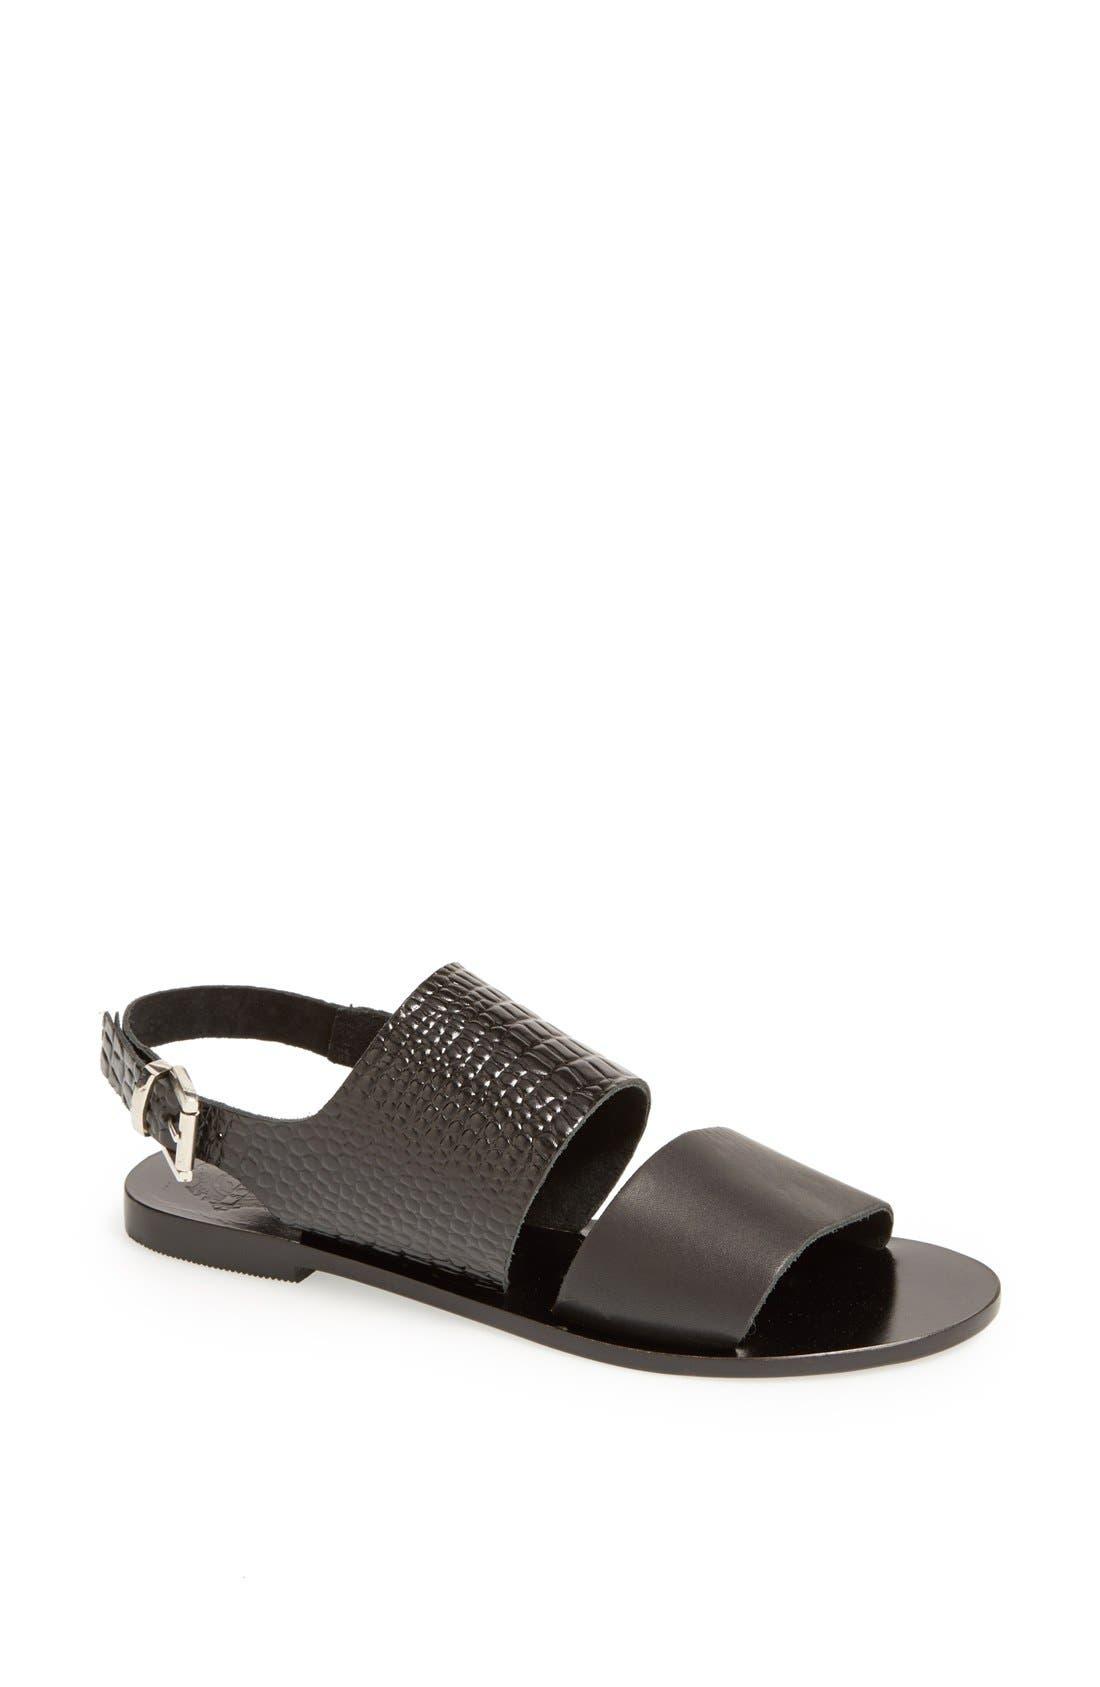 'Camilla' Sandal,                         Main,                         color, Black Patent/ Black